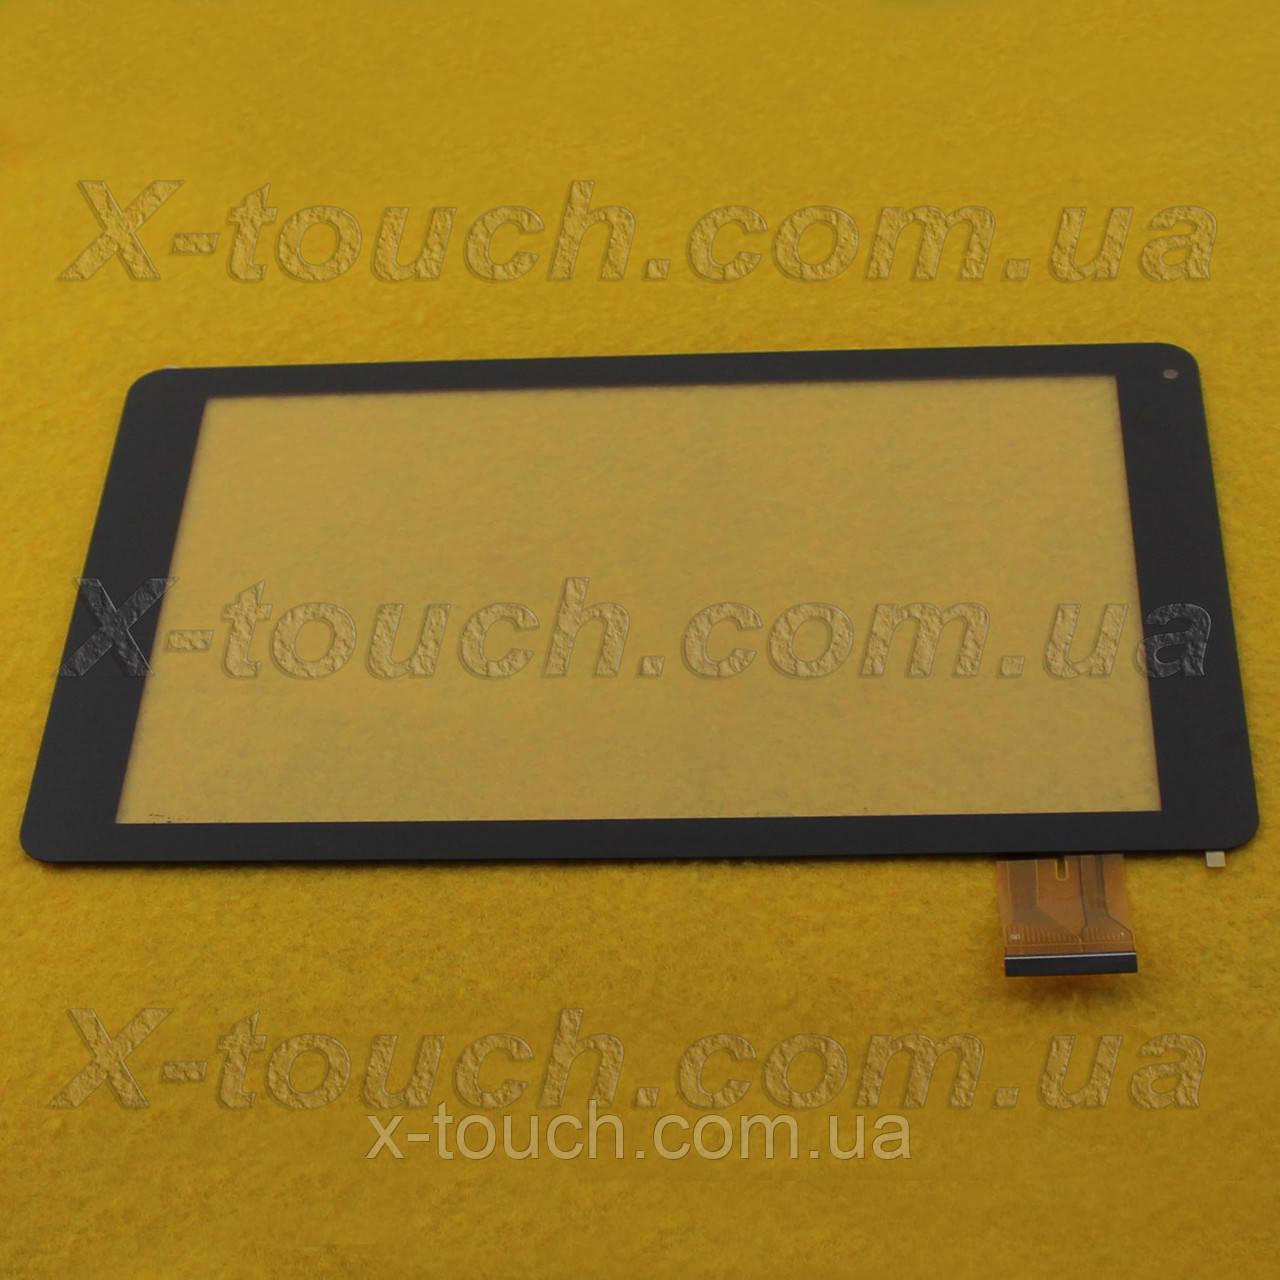 Тачскрин, сенсор Sigma mobile X-style Tab A104 для планшета, цвет черный - фото 1